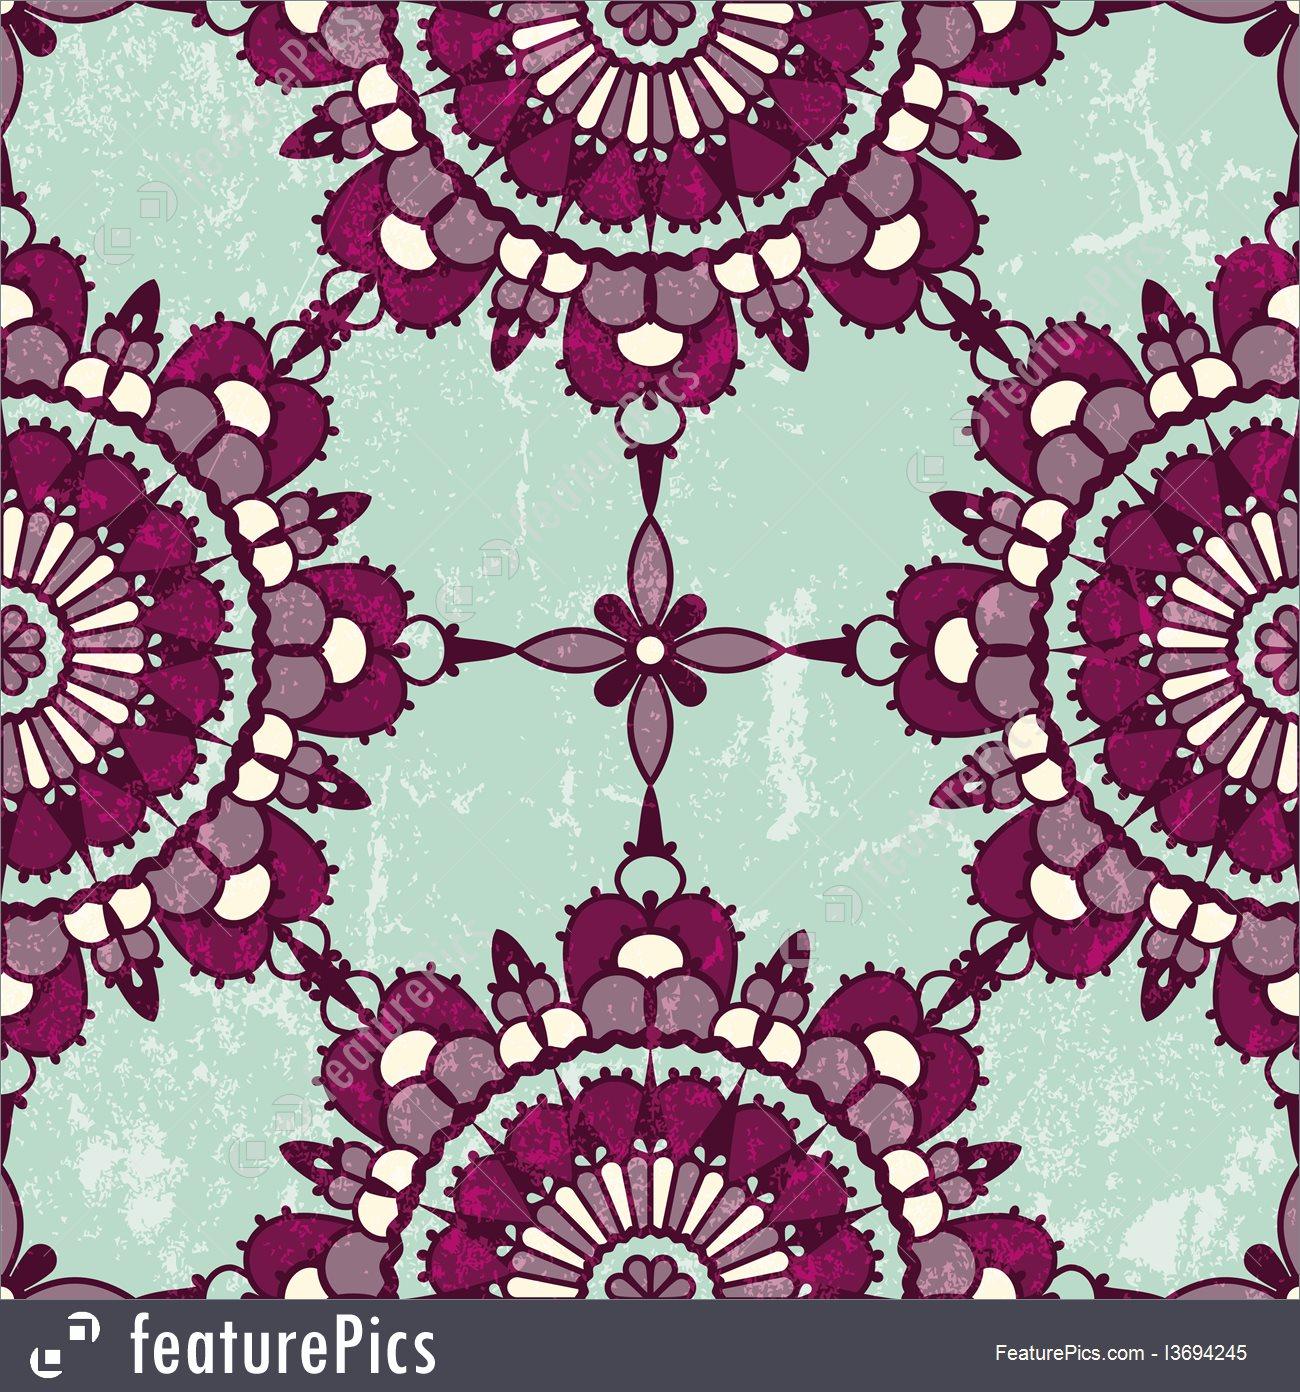 1300x1392 Abstract Patterns Persian Grunge Seamless Pattern.